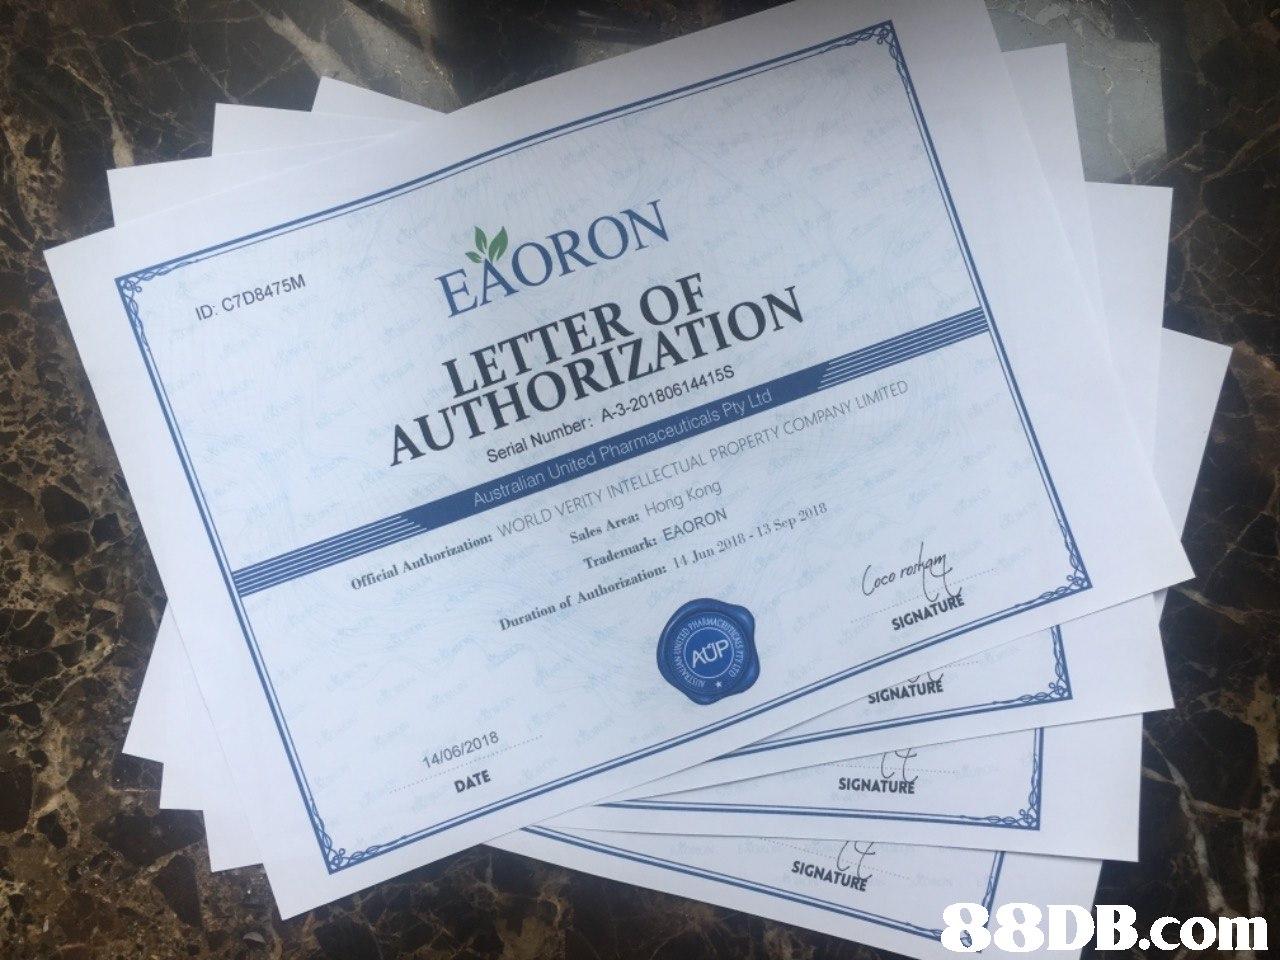 ID: C7D8475M EXORON LETTER OF AUTHORIZATION Serial Number: A-3-20180614415S Offieial Authorization: WORLD VERITY INTELLECTUAL PROPERTY COMPANY LIMITED Sales Area: Hong Kong Australian United Pharmaceuticals Pty Ltd Trademark: EAORON Duration of Authorization: 14 Jun 2018- 13 Sep 2018 poo AUP SIGNATU 14/06/2018 DATE URE SIGNATU SIGNATURE SIGNATU 8є в.com